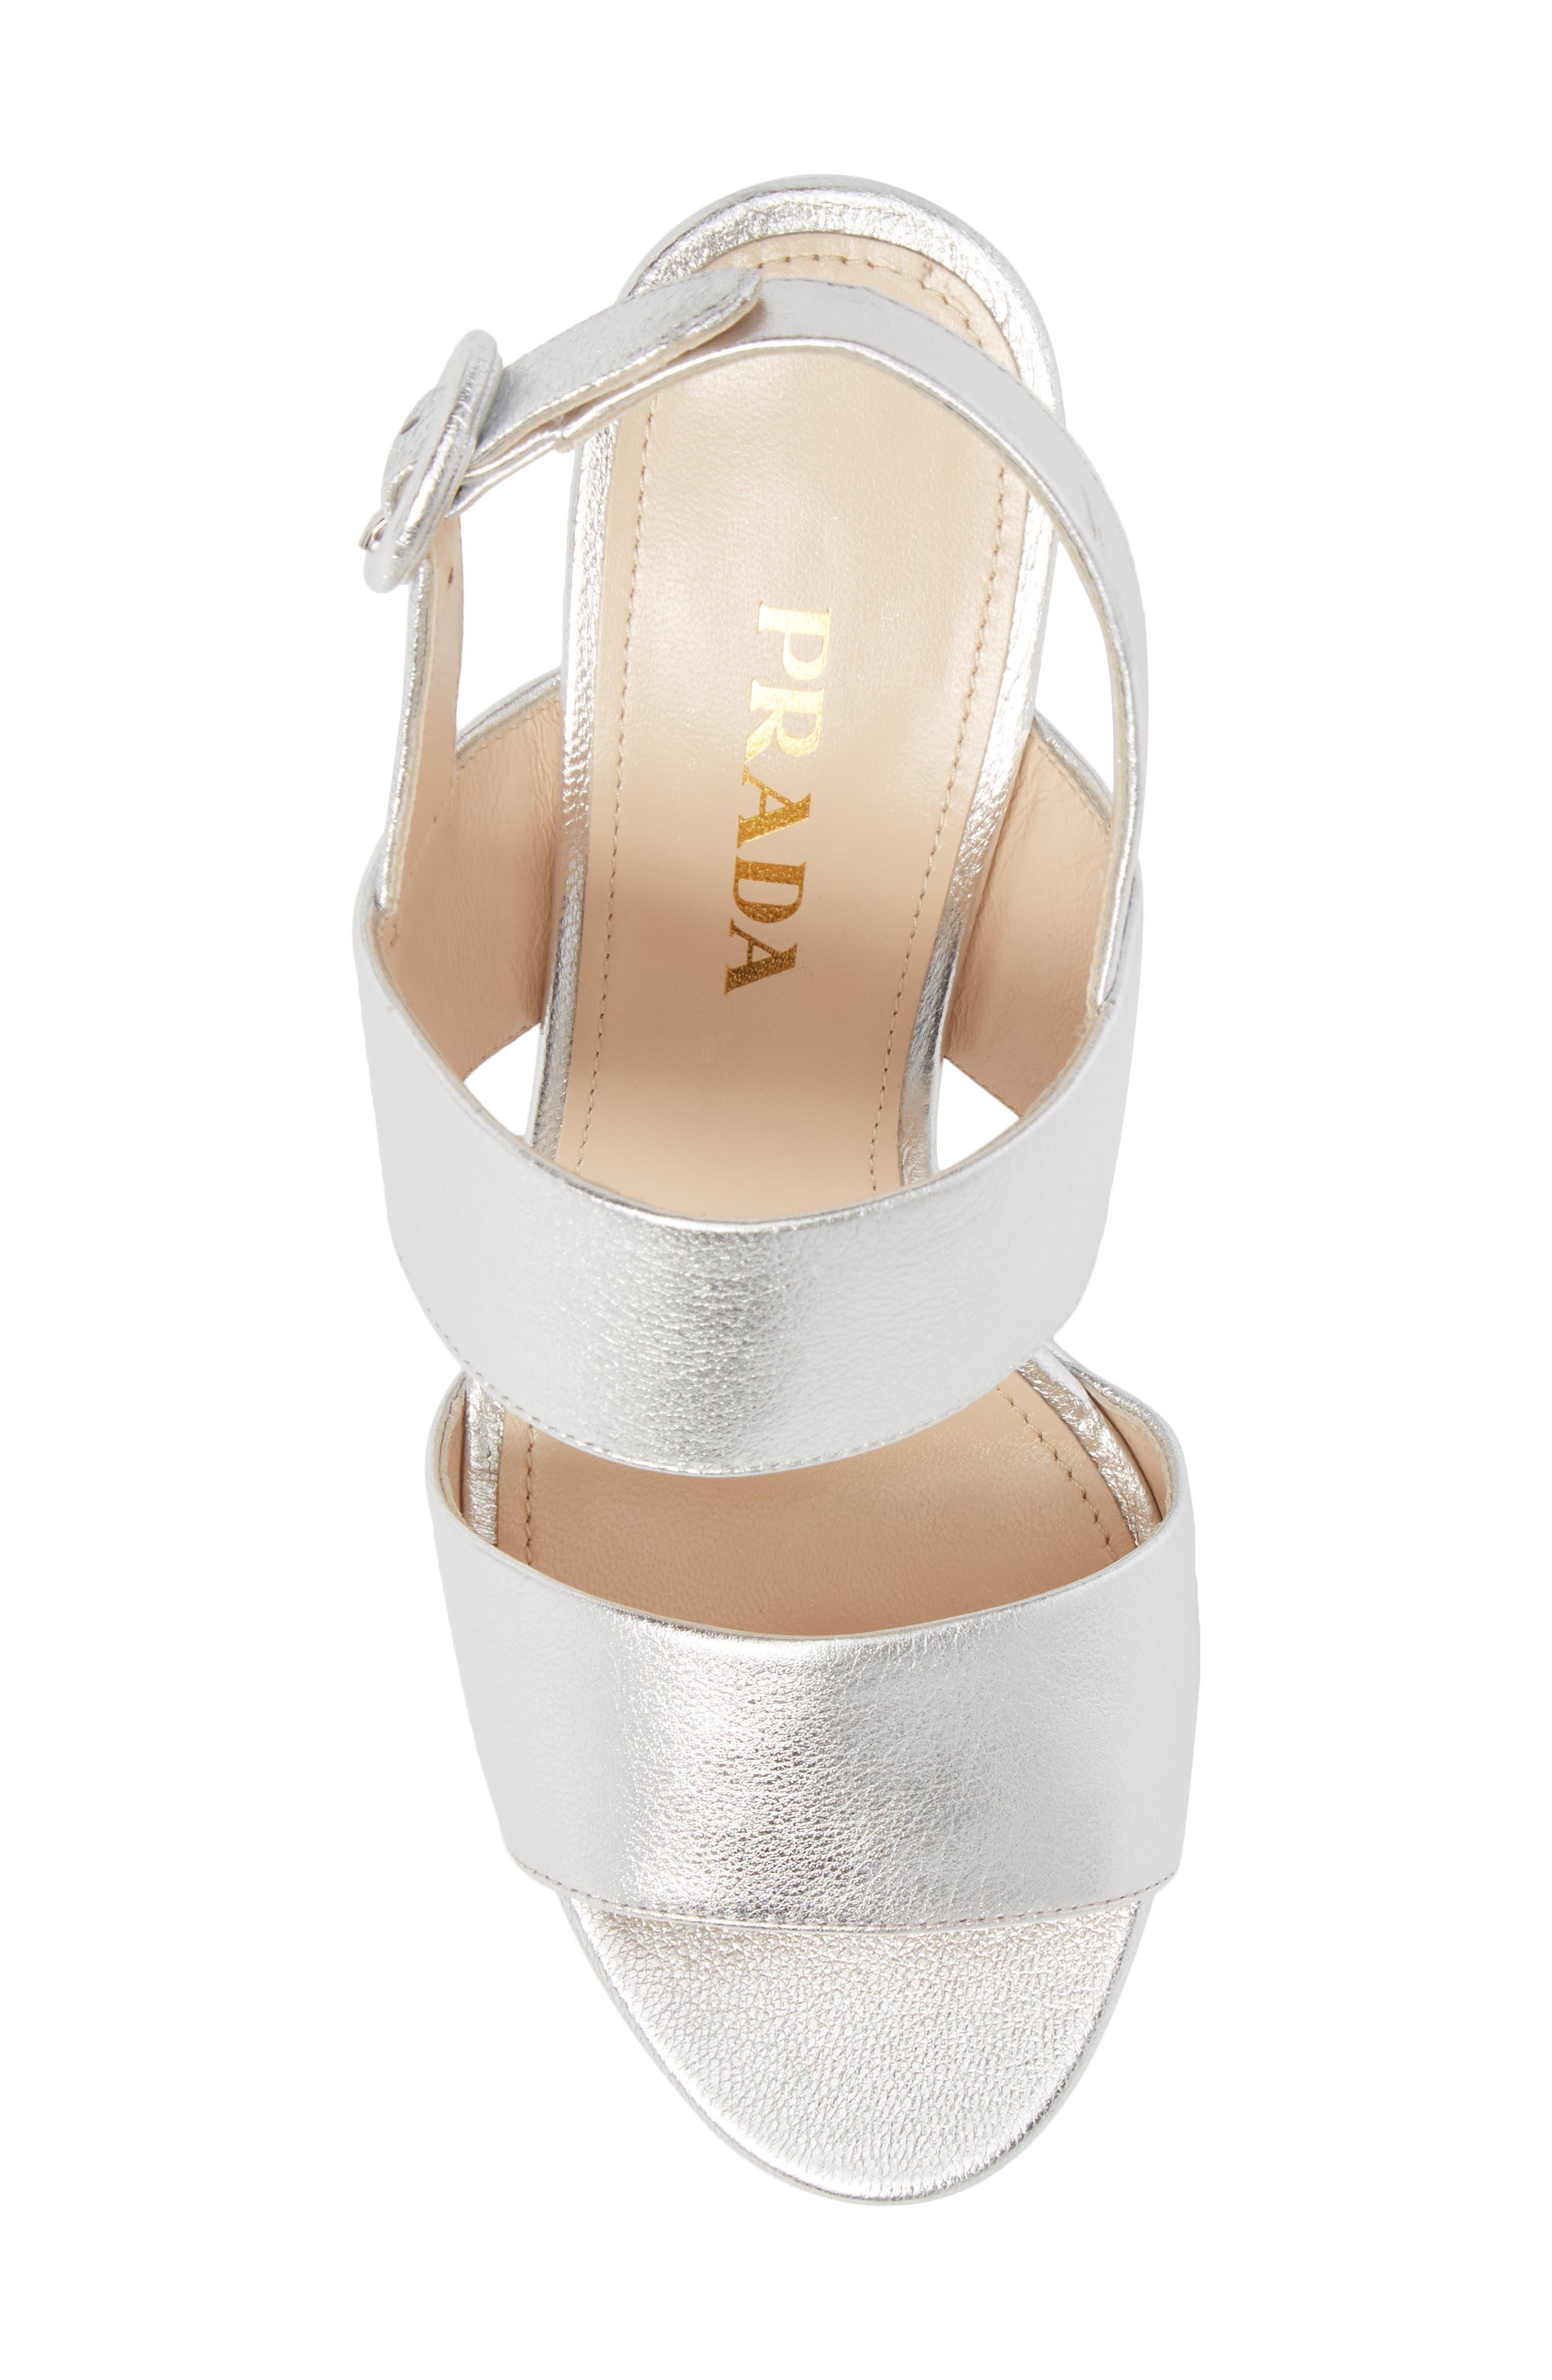 PRADA, Double Band Platform Sandal, Alternate thumbnail 5, color, SILVER